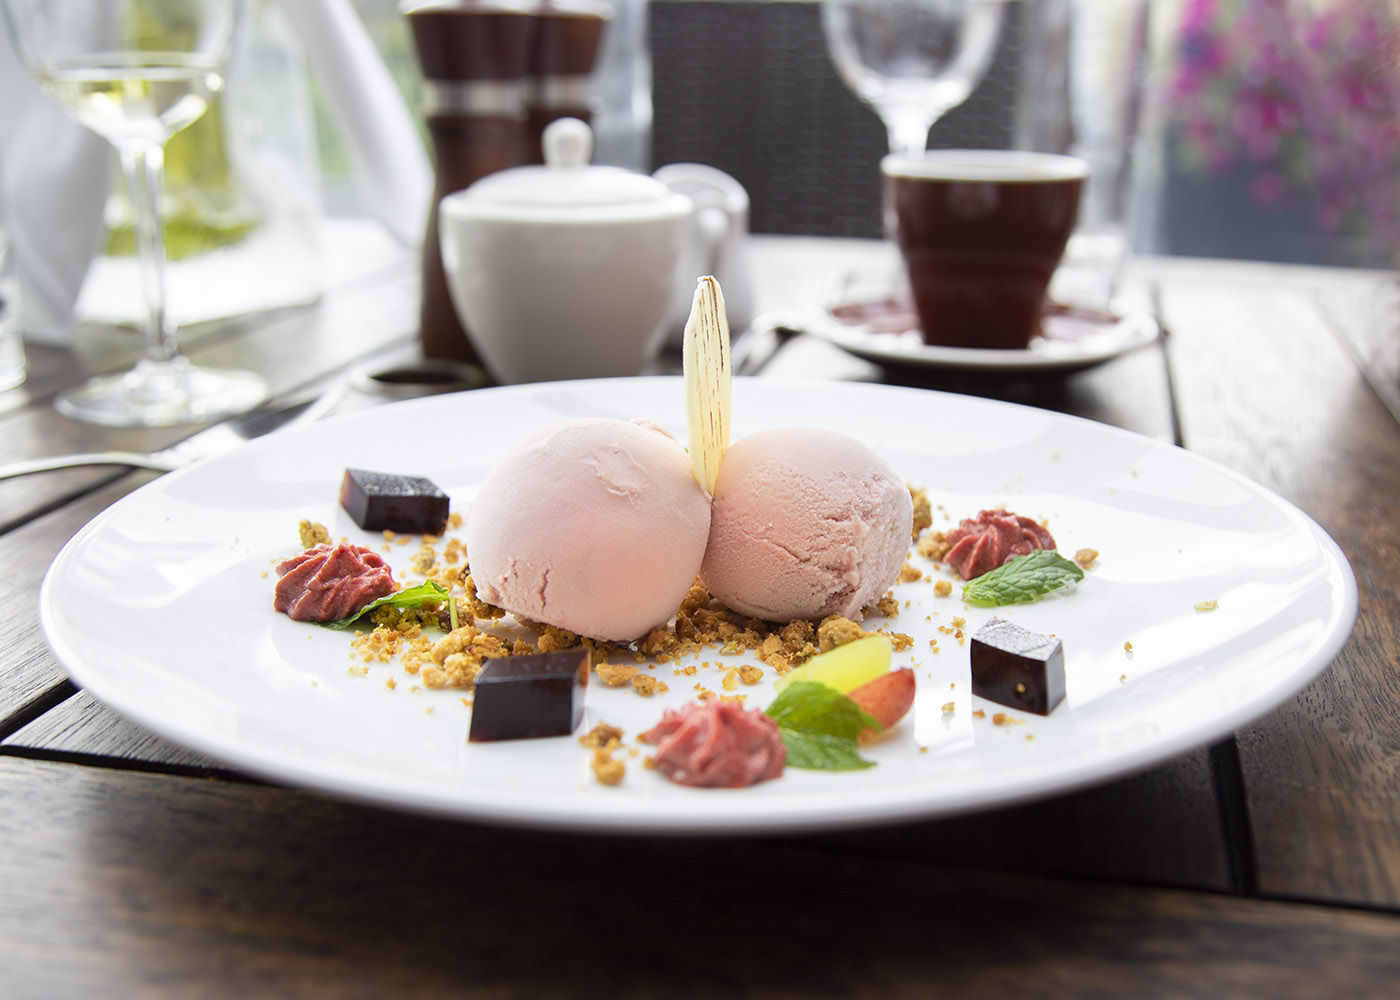 plumes dessert